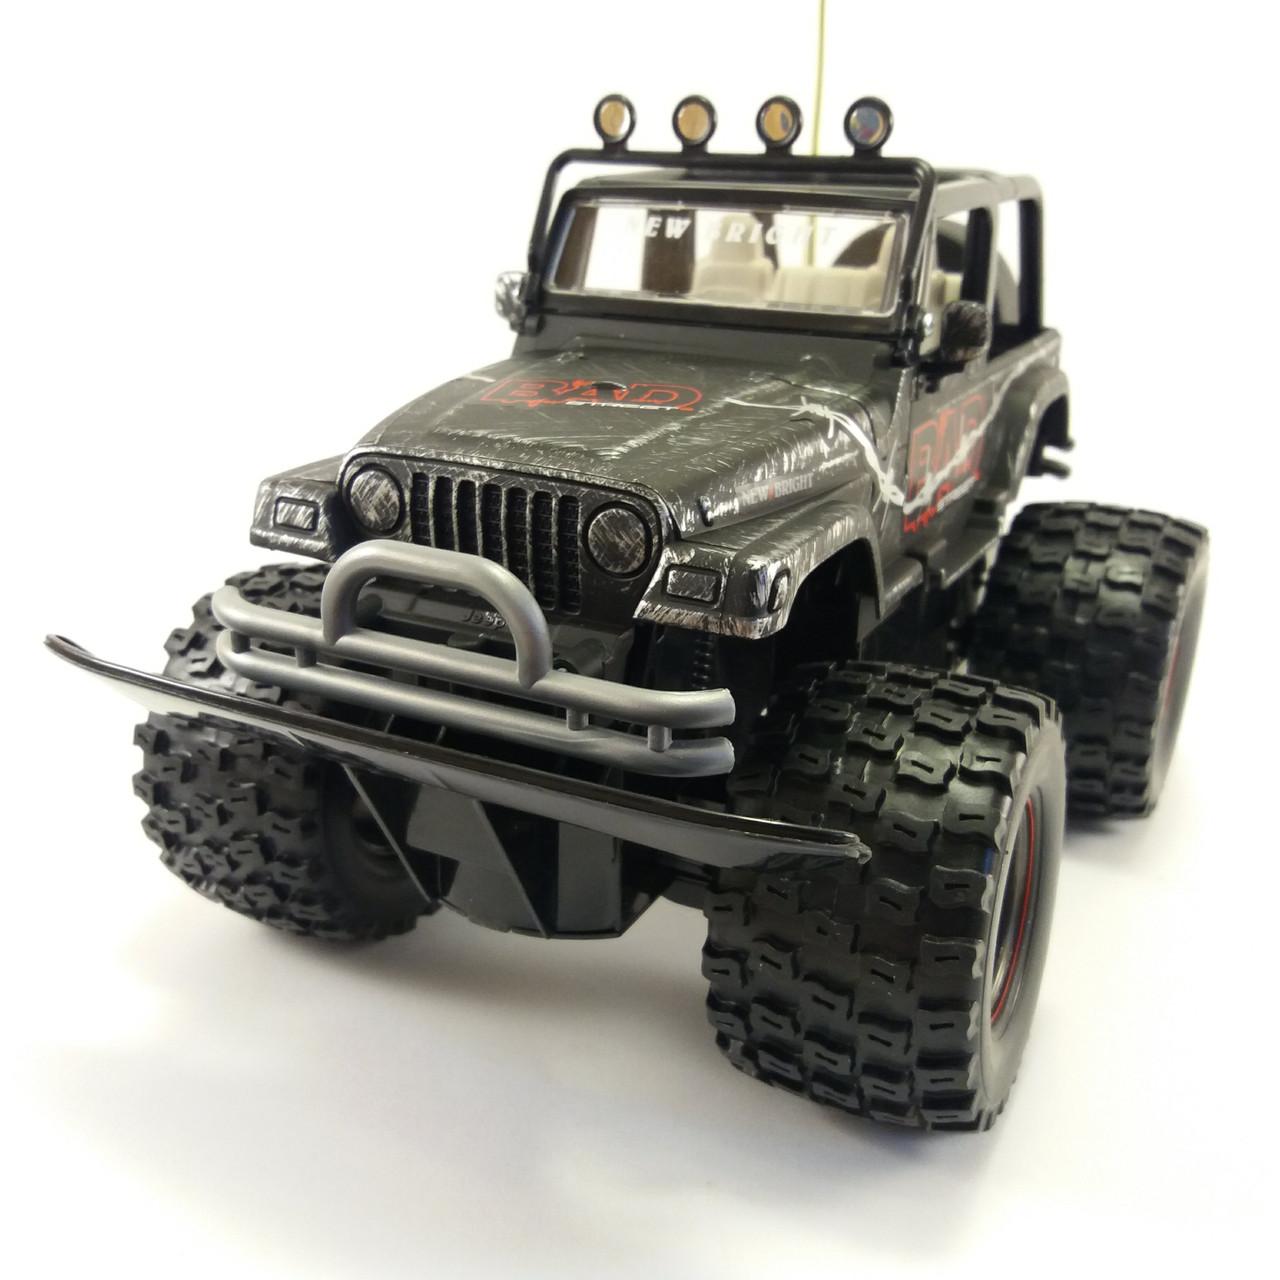 "Автомобиль на радиоуправлении Jeep ""Bad Street Wrangler"", масштаб 1:20 NEW BRIGHT 22099"